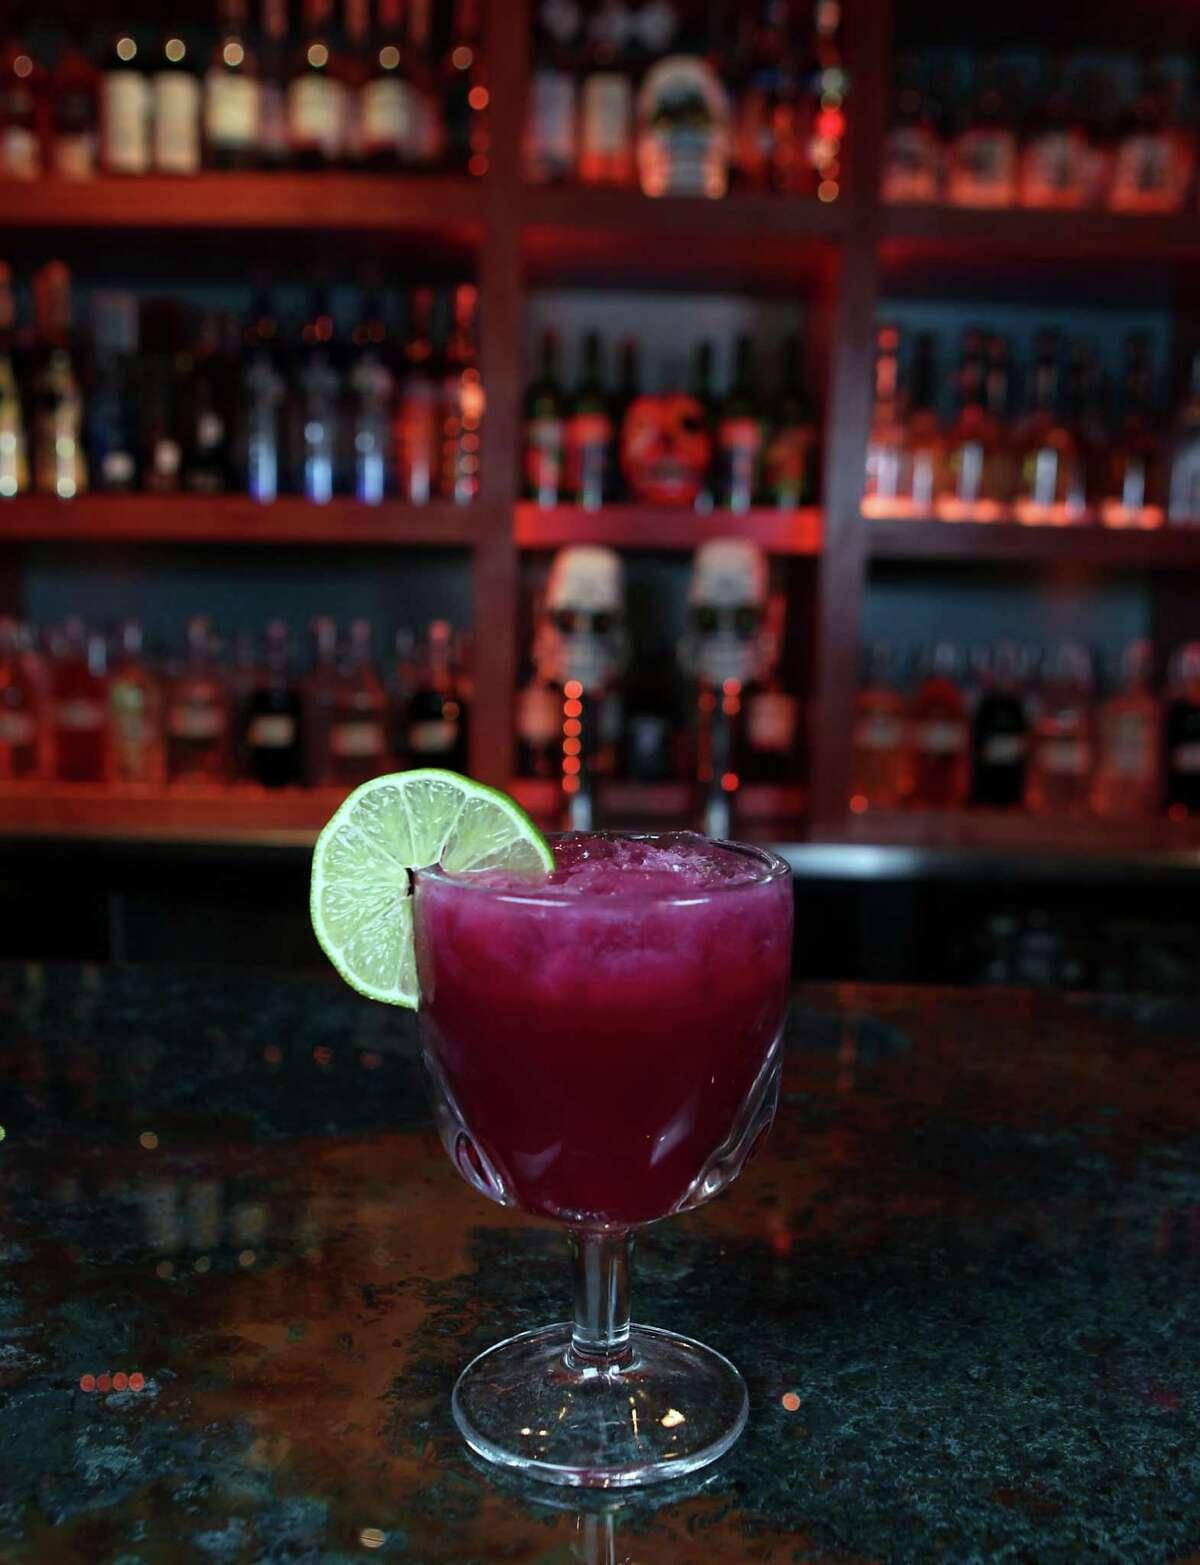 The Beet margarita at El Big Bad Mexican restaurant Tuesday, Nov. 26, 2013, in Houston. ( James Nielsen / Houston Chronicle )